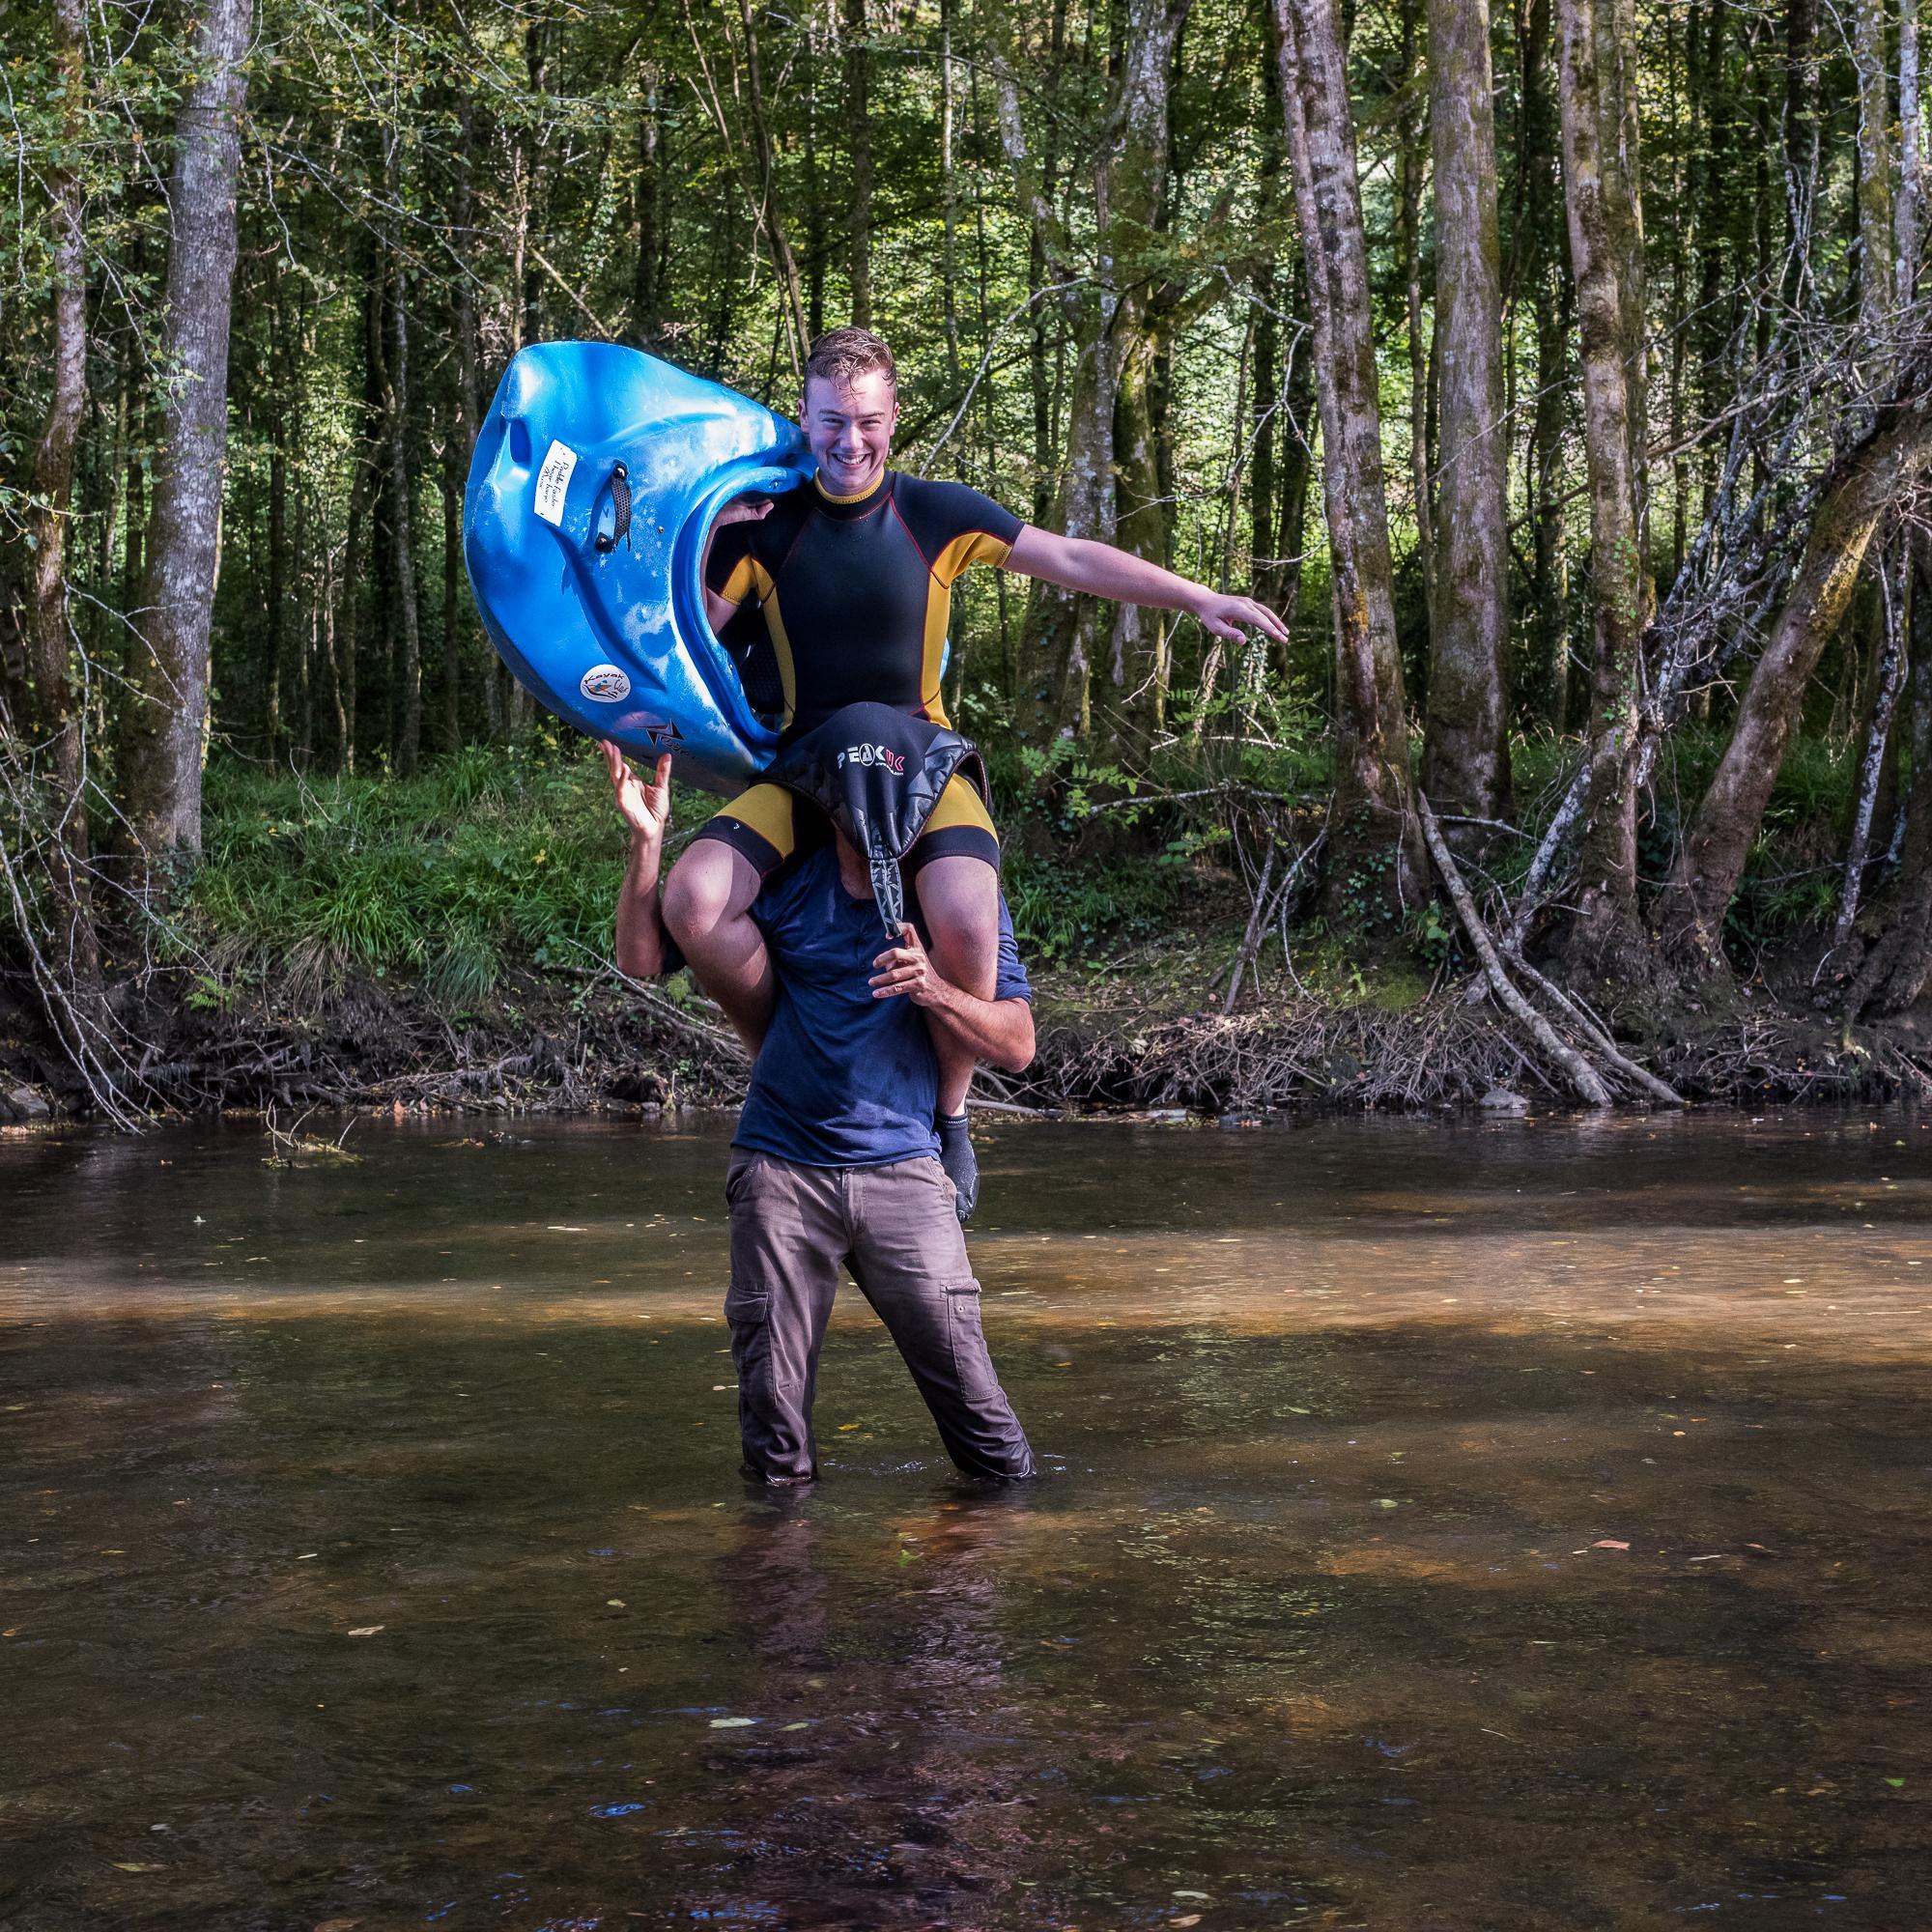 Kayak - Le free style